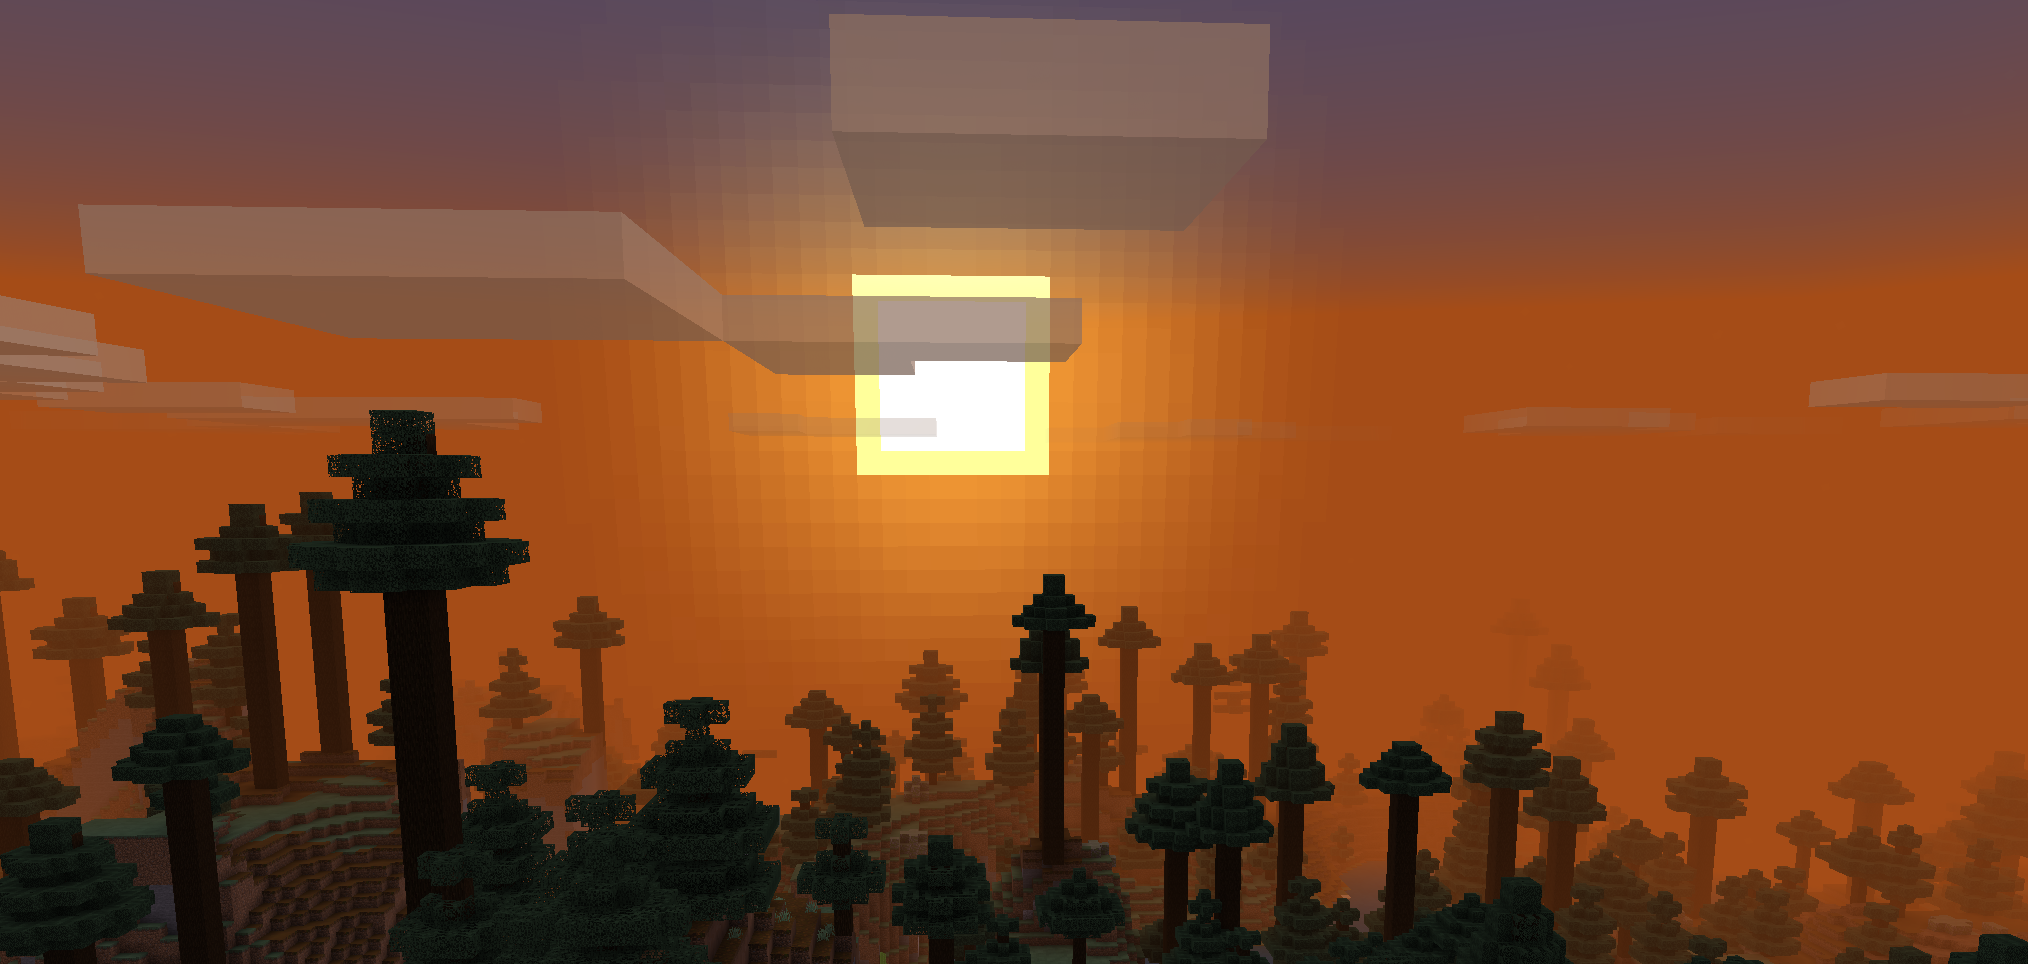 Minecraft Backgrounds Minecraft Wallpaper Background Sunset Background